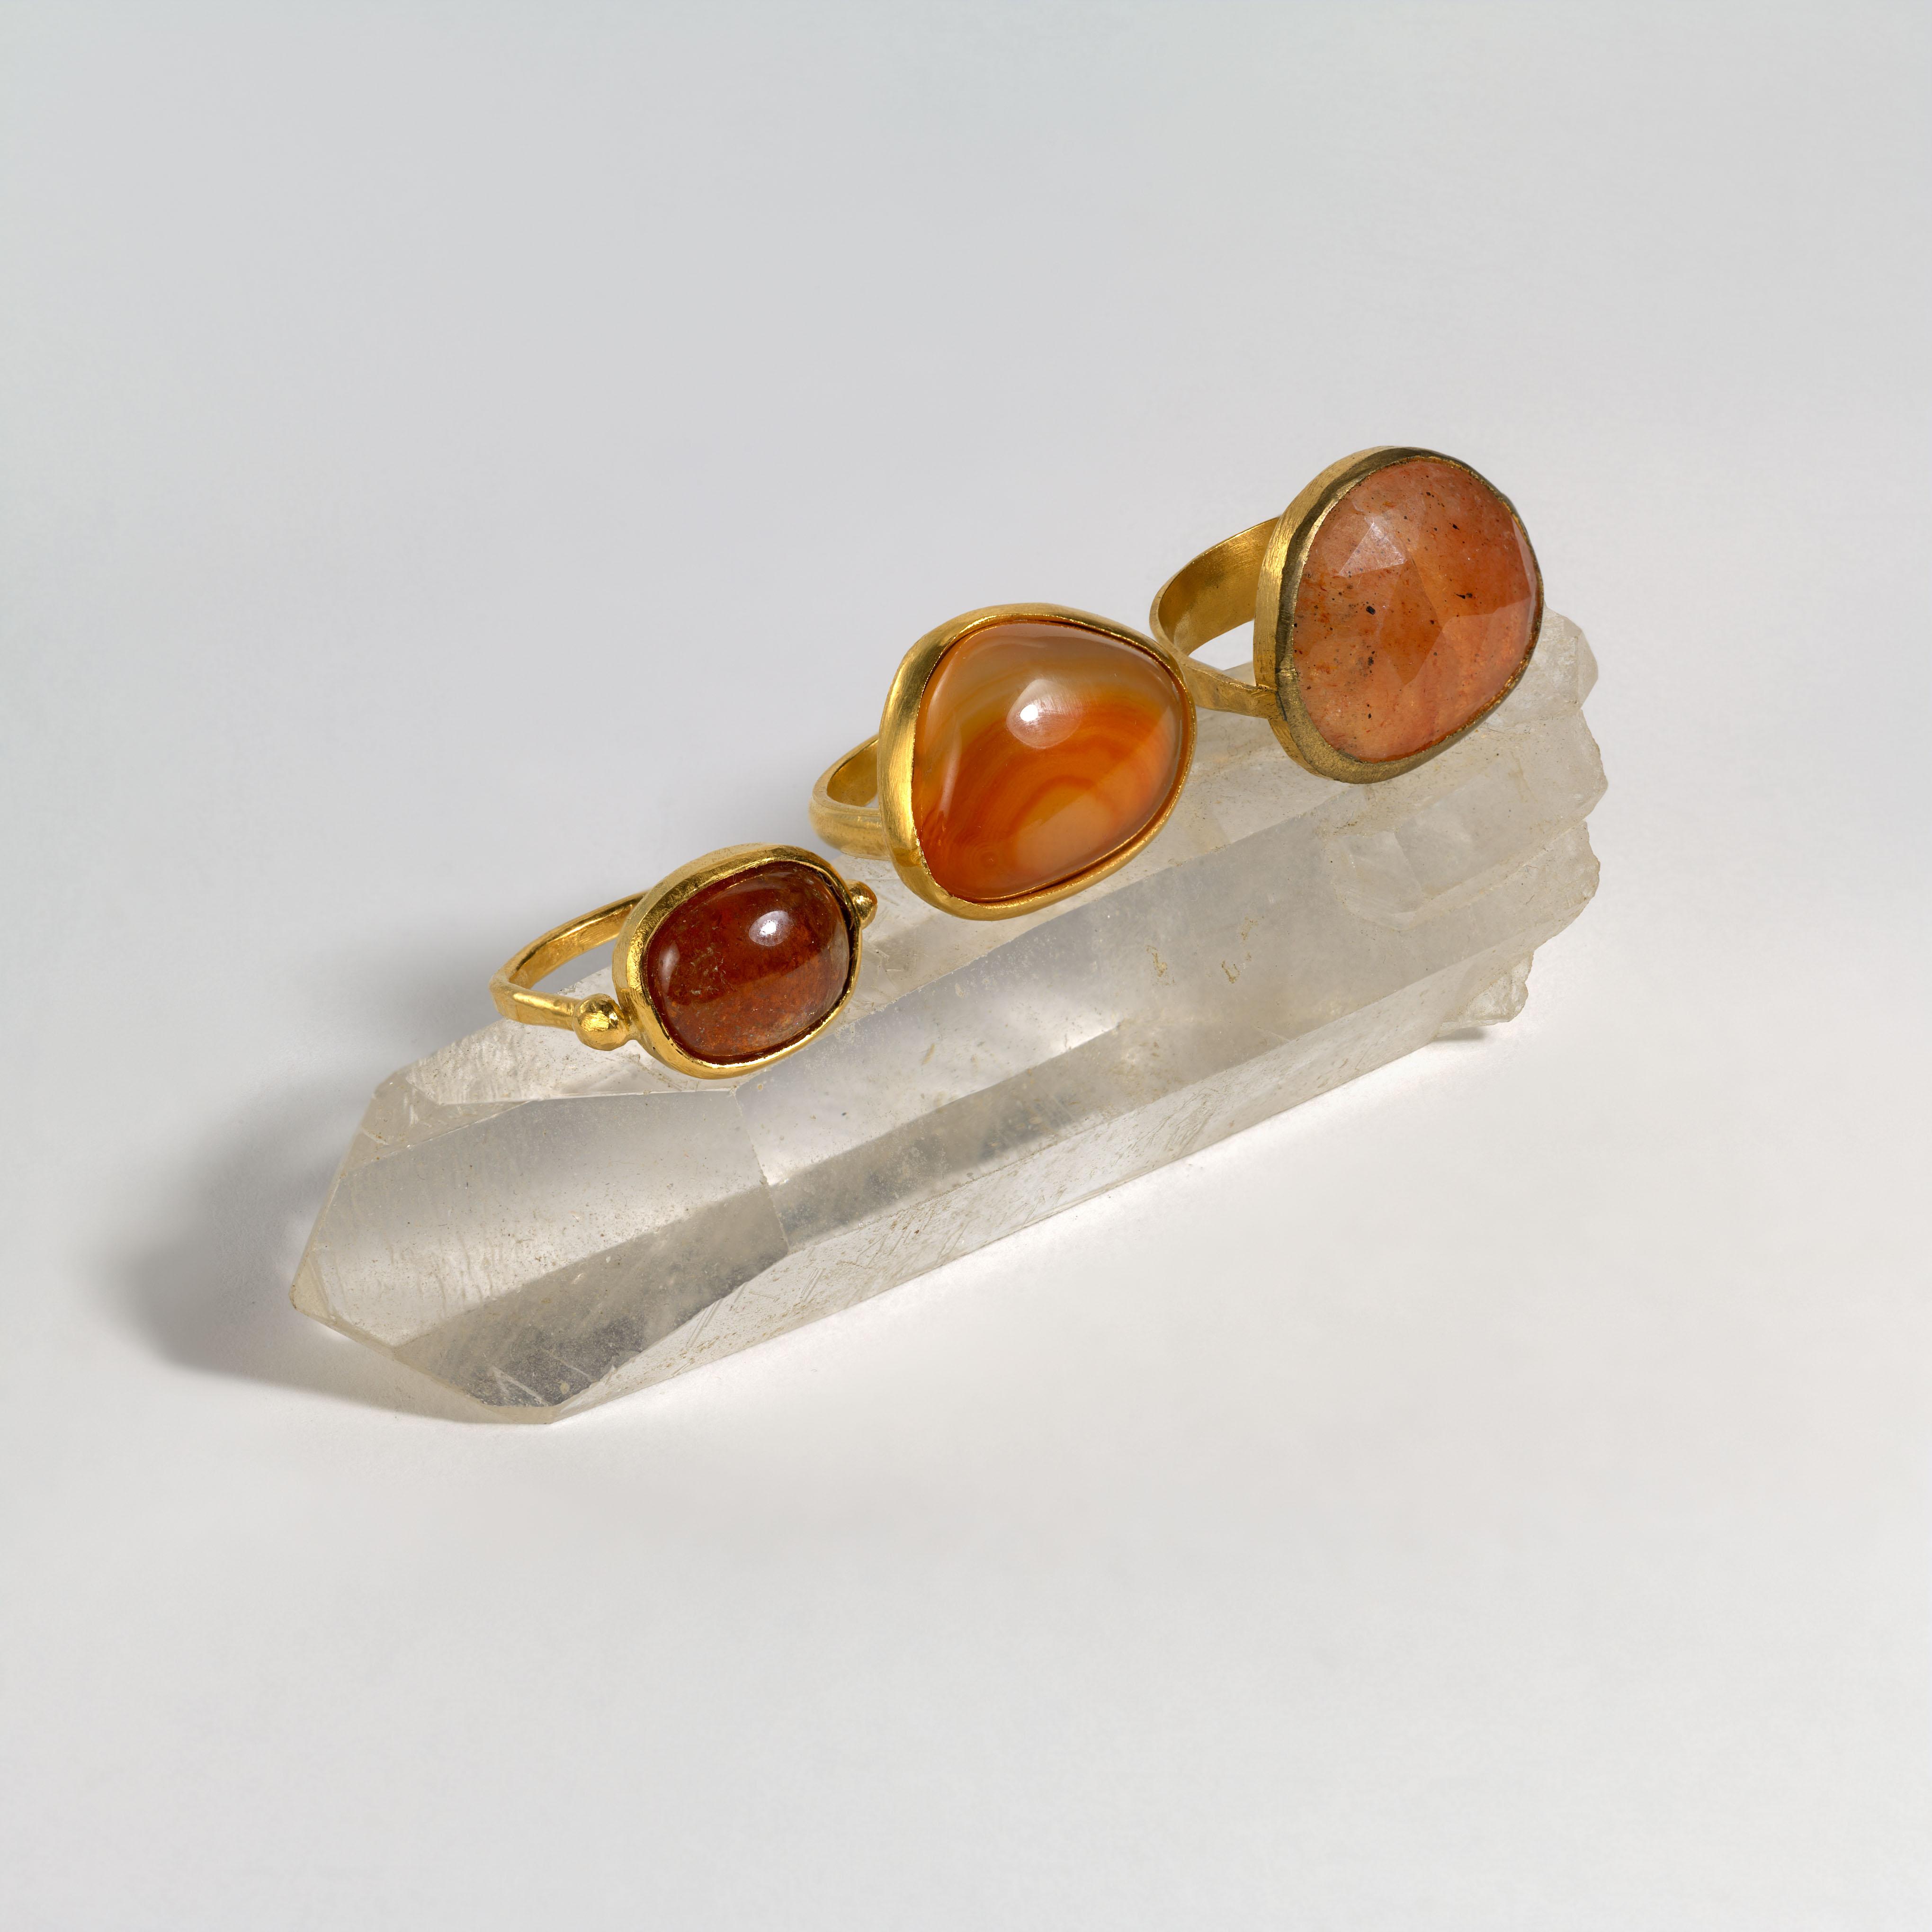 Orange - Sacral Chakra - Svadhisthana